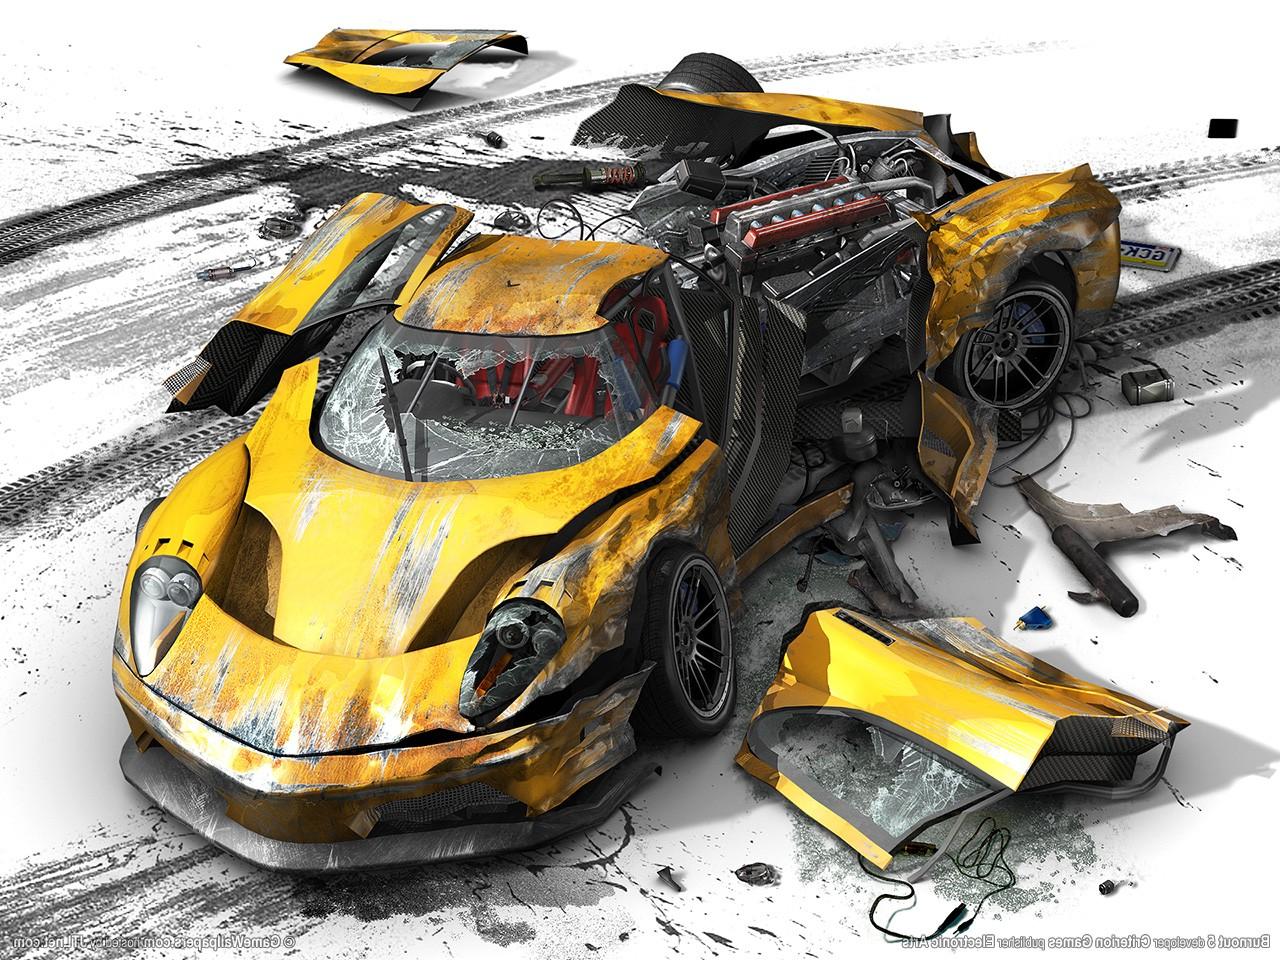 Wallpaper Illustration Toy Sports Car Crash Destruction